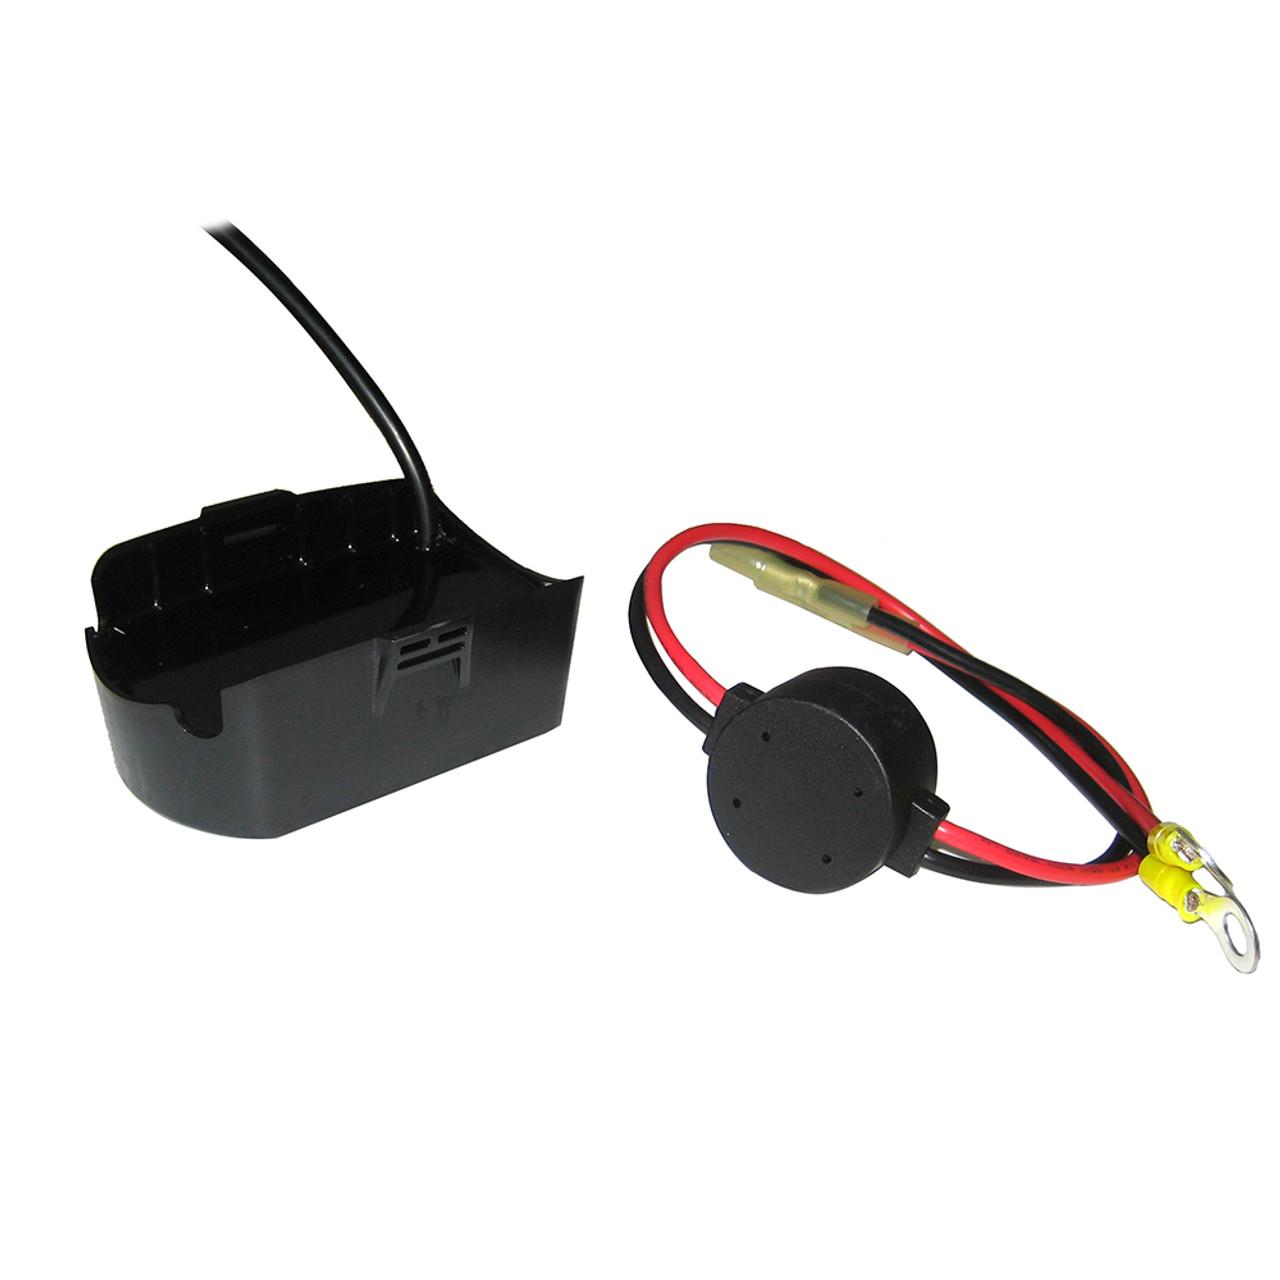 Carxtc Speaker Connection Plugs for Replacing Factory Front Door 6.5 Inch Speakers Fits Subaru Impreza 1993-2007